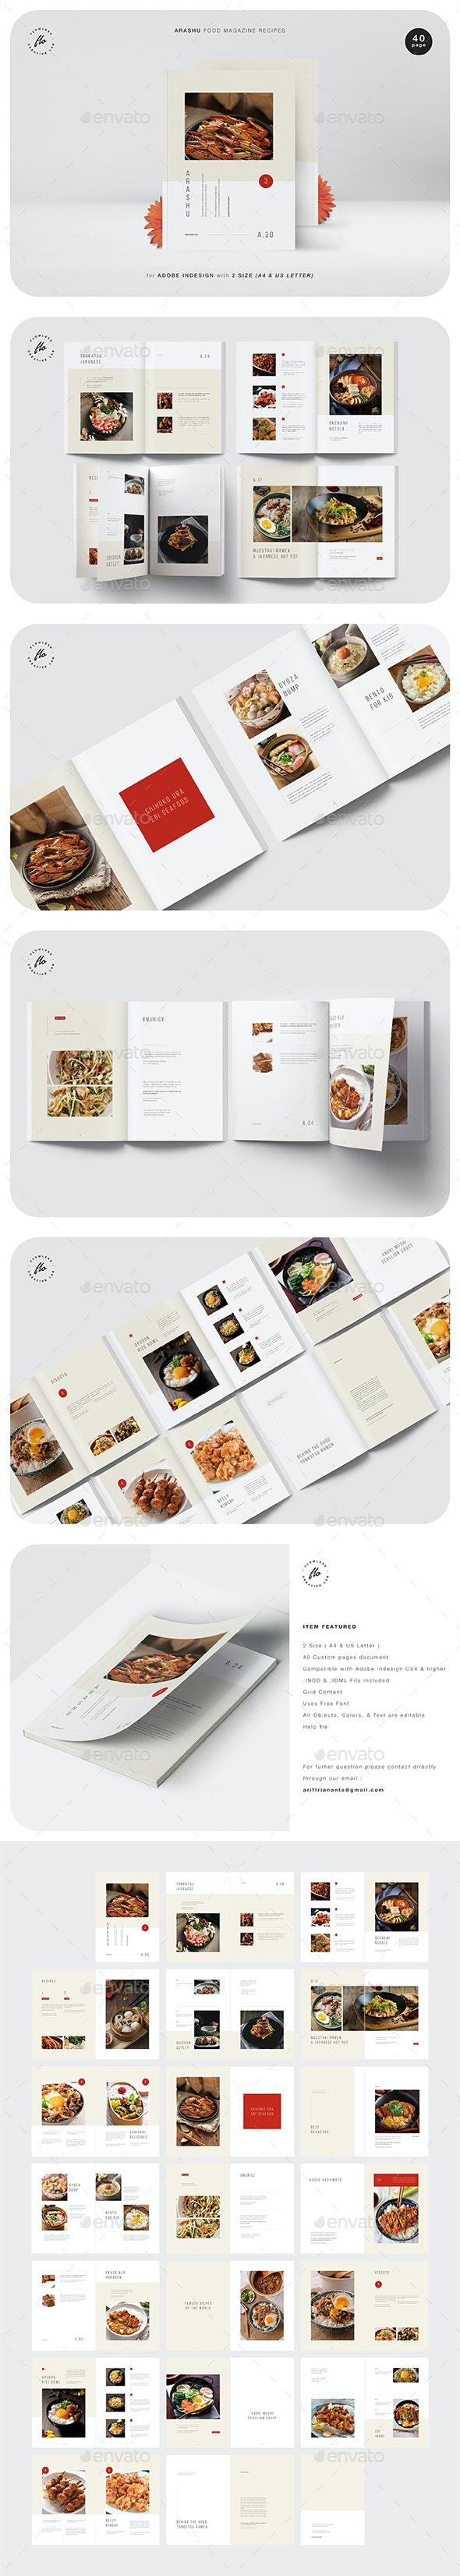 Arashu Food Magazine Recipes - Magazines Print Templates